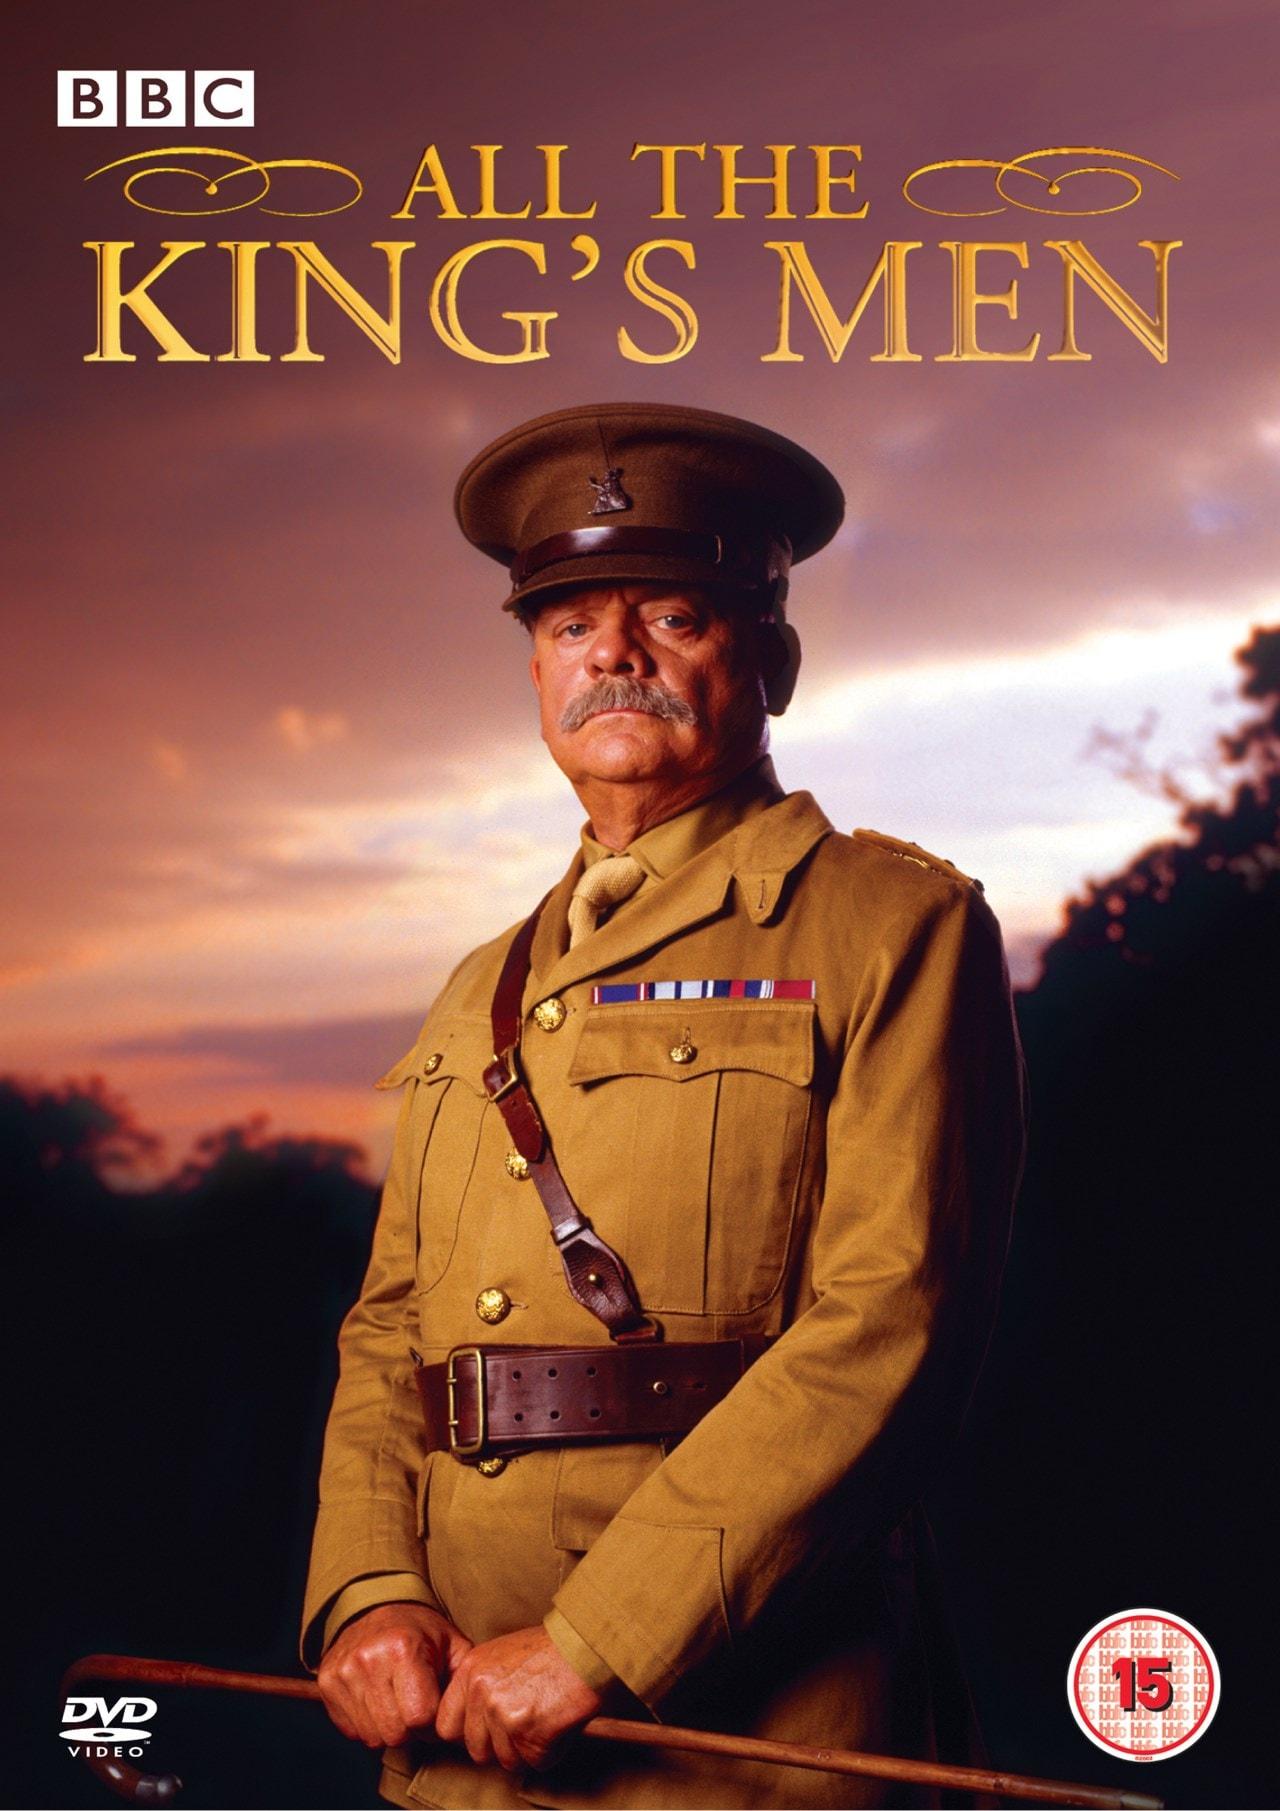 All the King's Men - 1